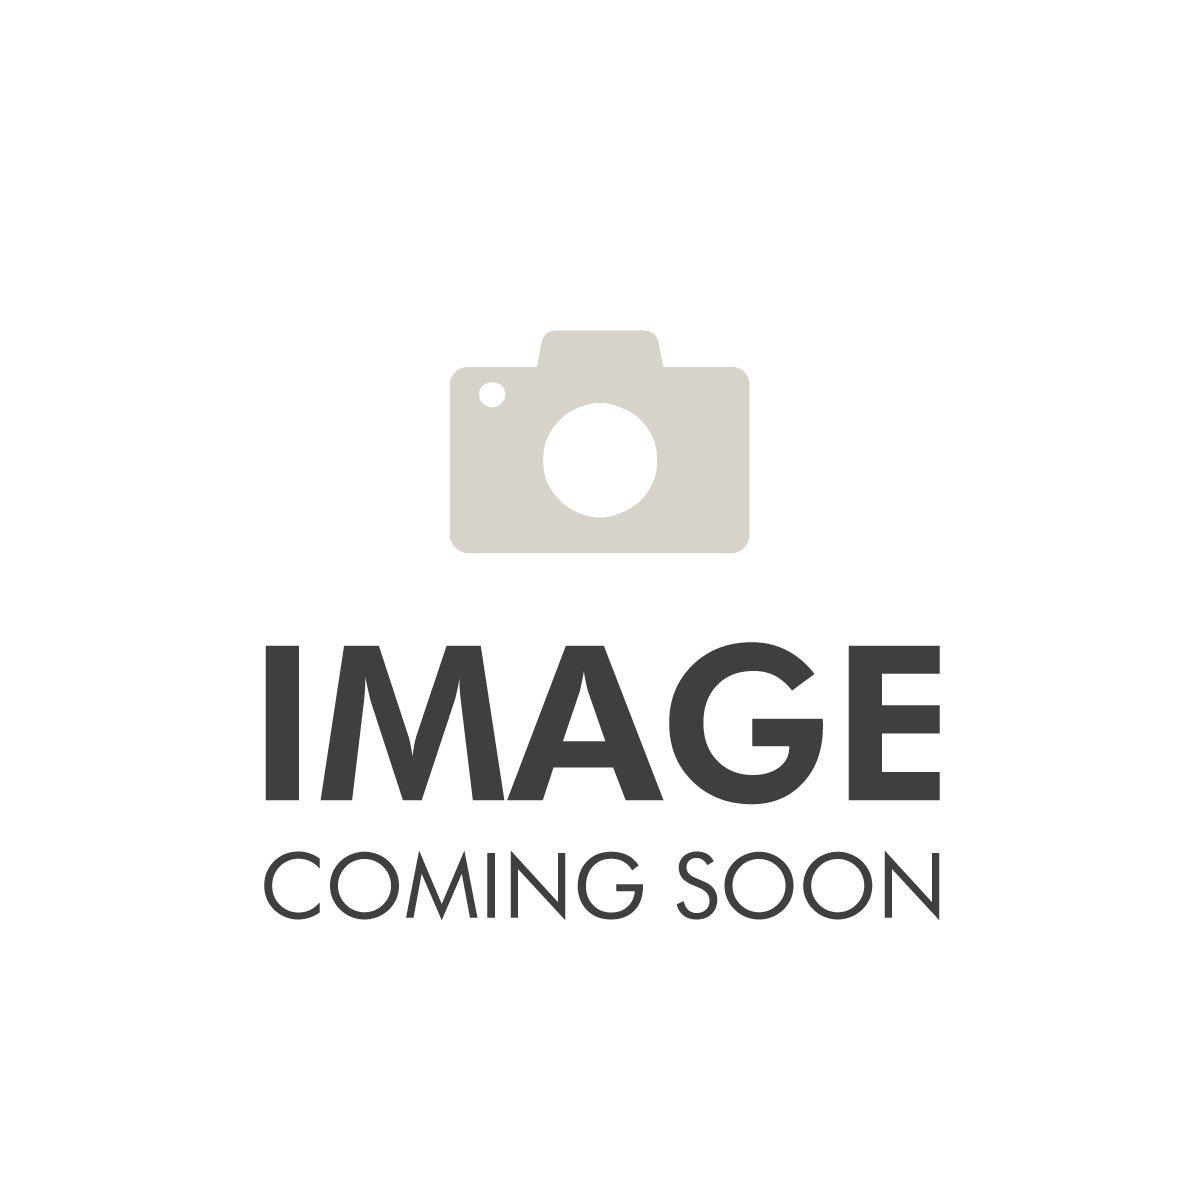 L'Oreal Loreal Anti Wrinkle Firming Cream 45